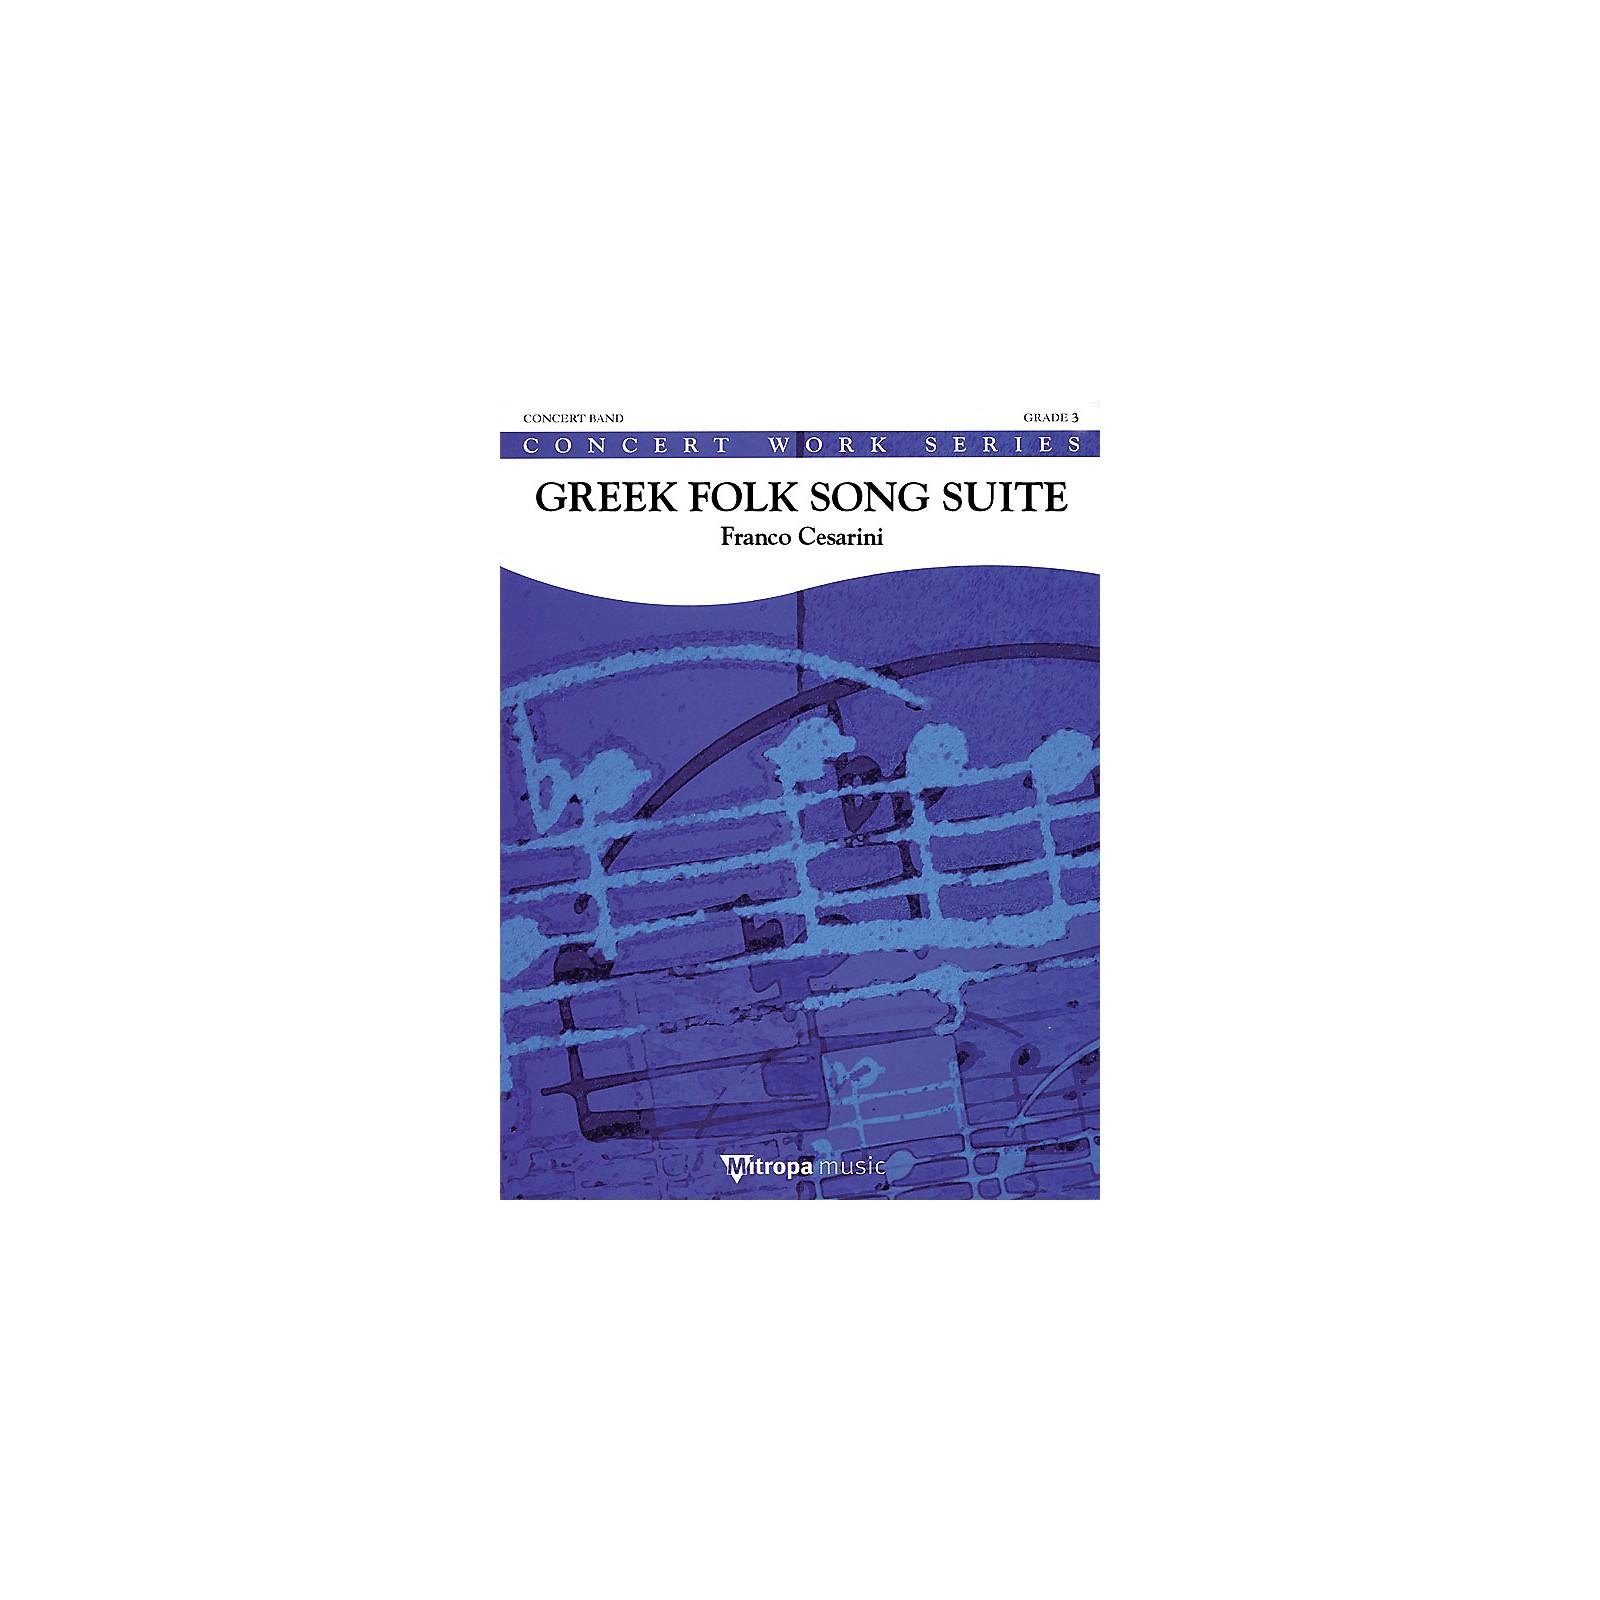 De Haske Music Greek Folk Song Suite (Score Only) Concert Band Composed by Franco Cesarini